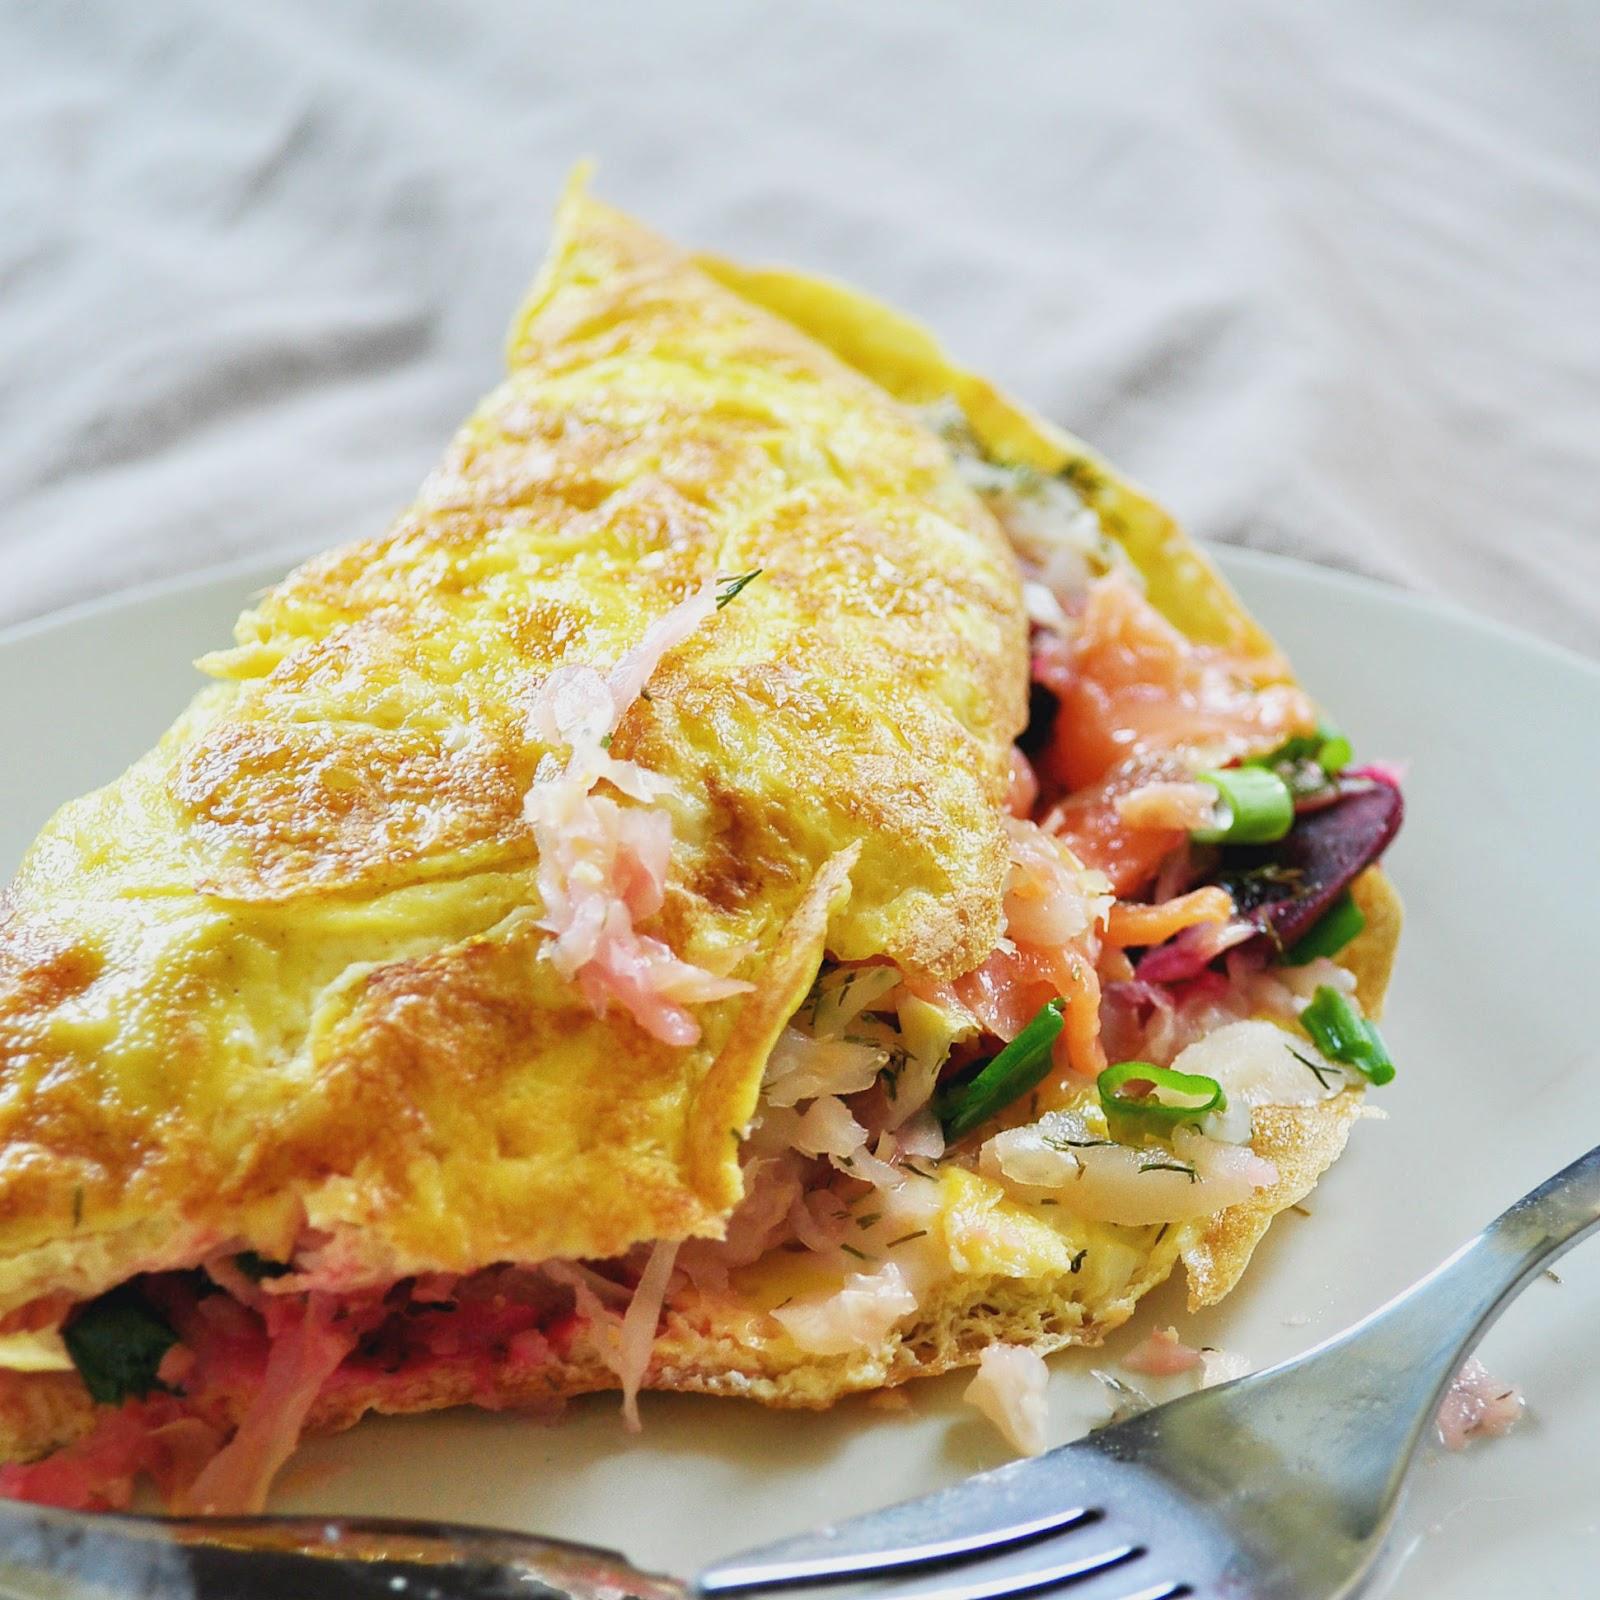 Omelette HD wallpapers, Desktop wallpaper - most viewed